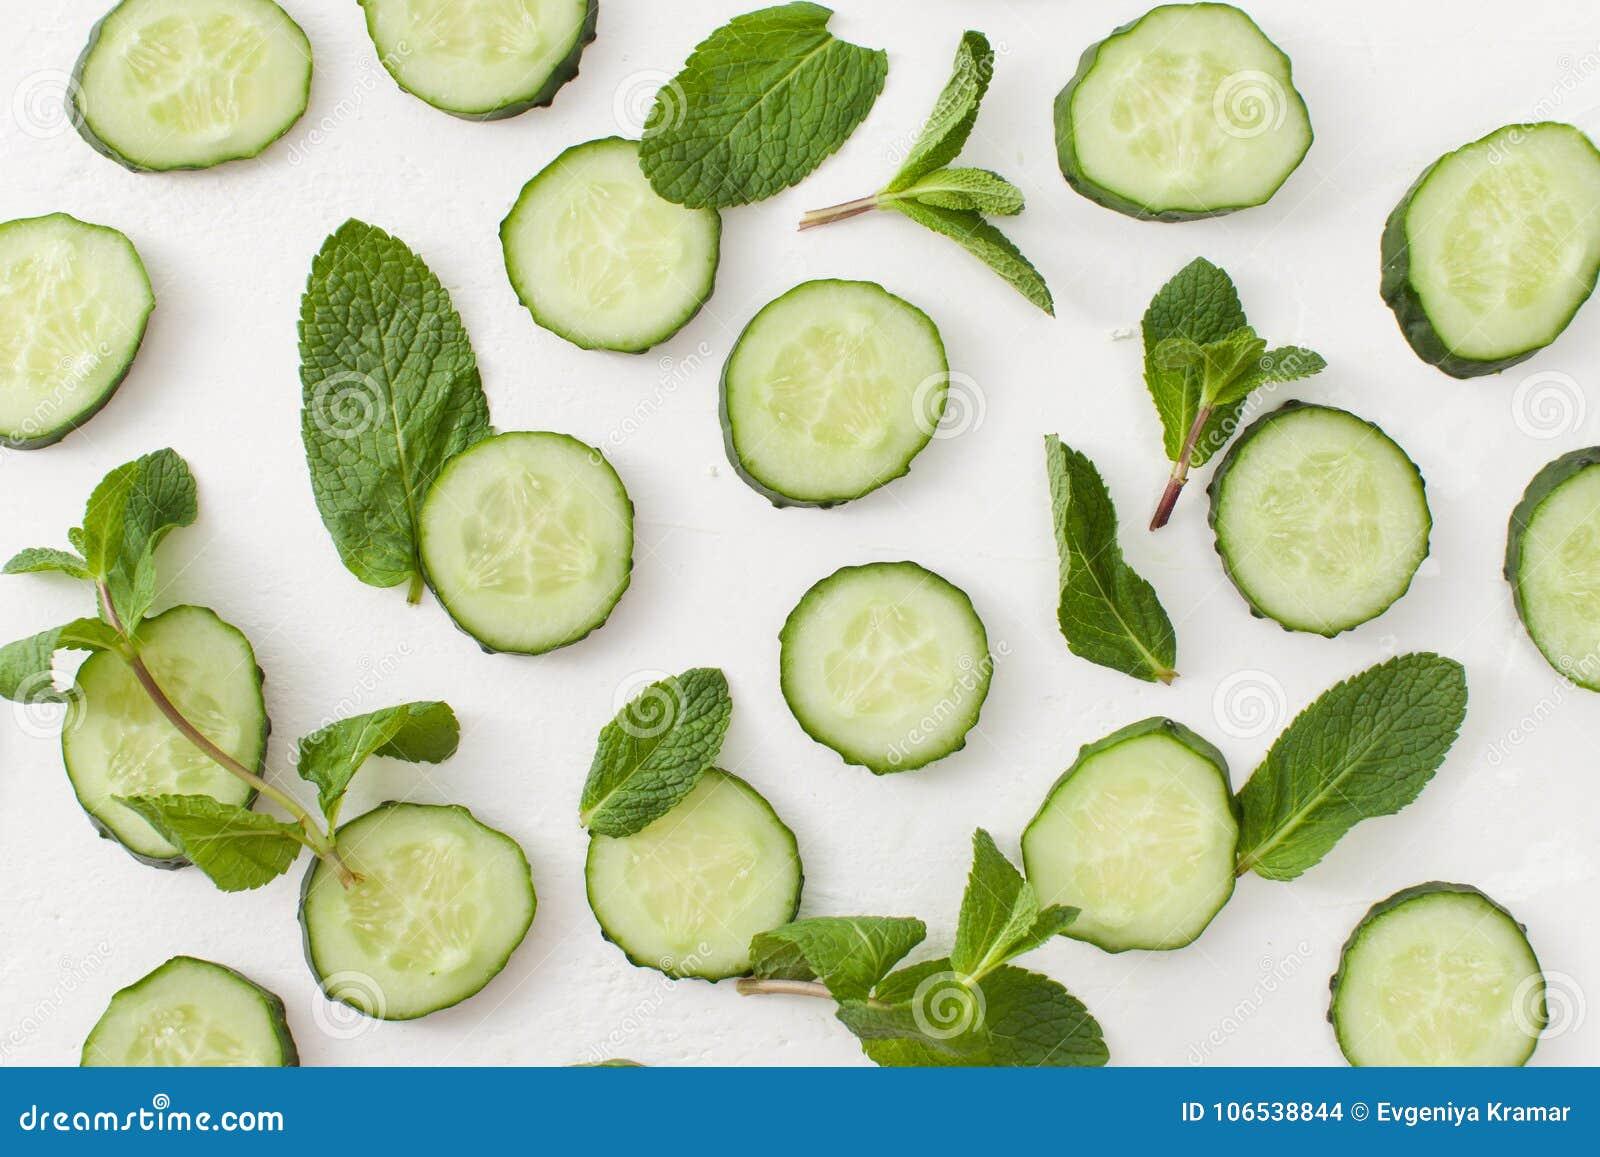 Useful properties of cucumber. Cucumbers: useful properties and contraindications 26